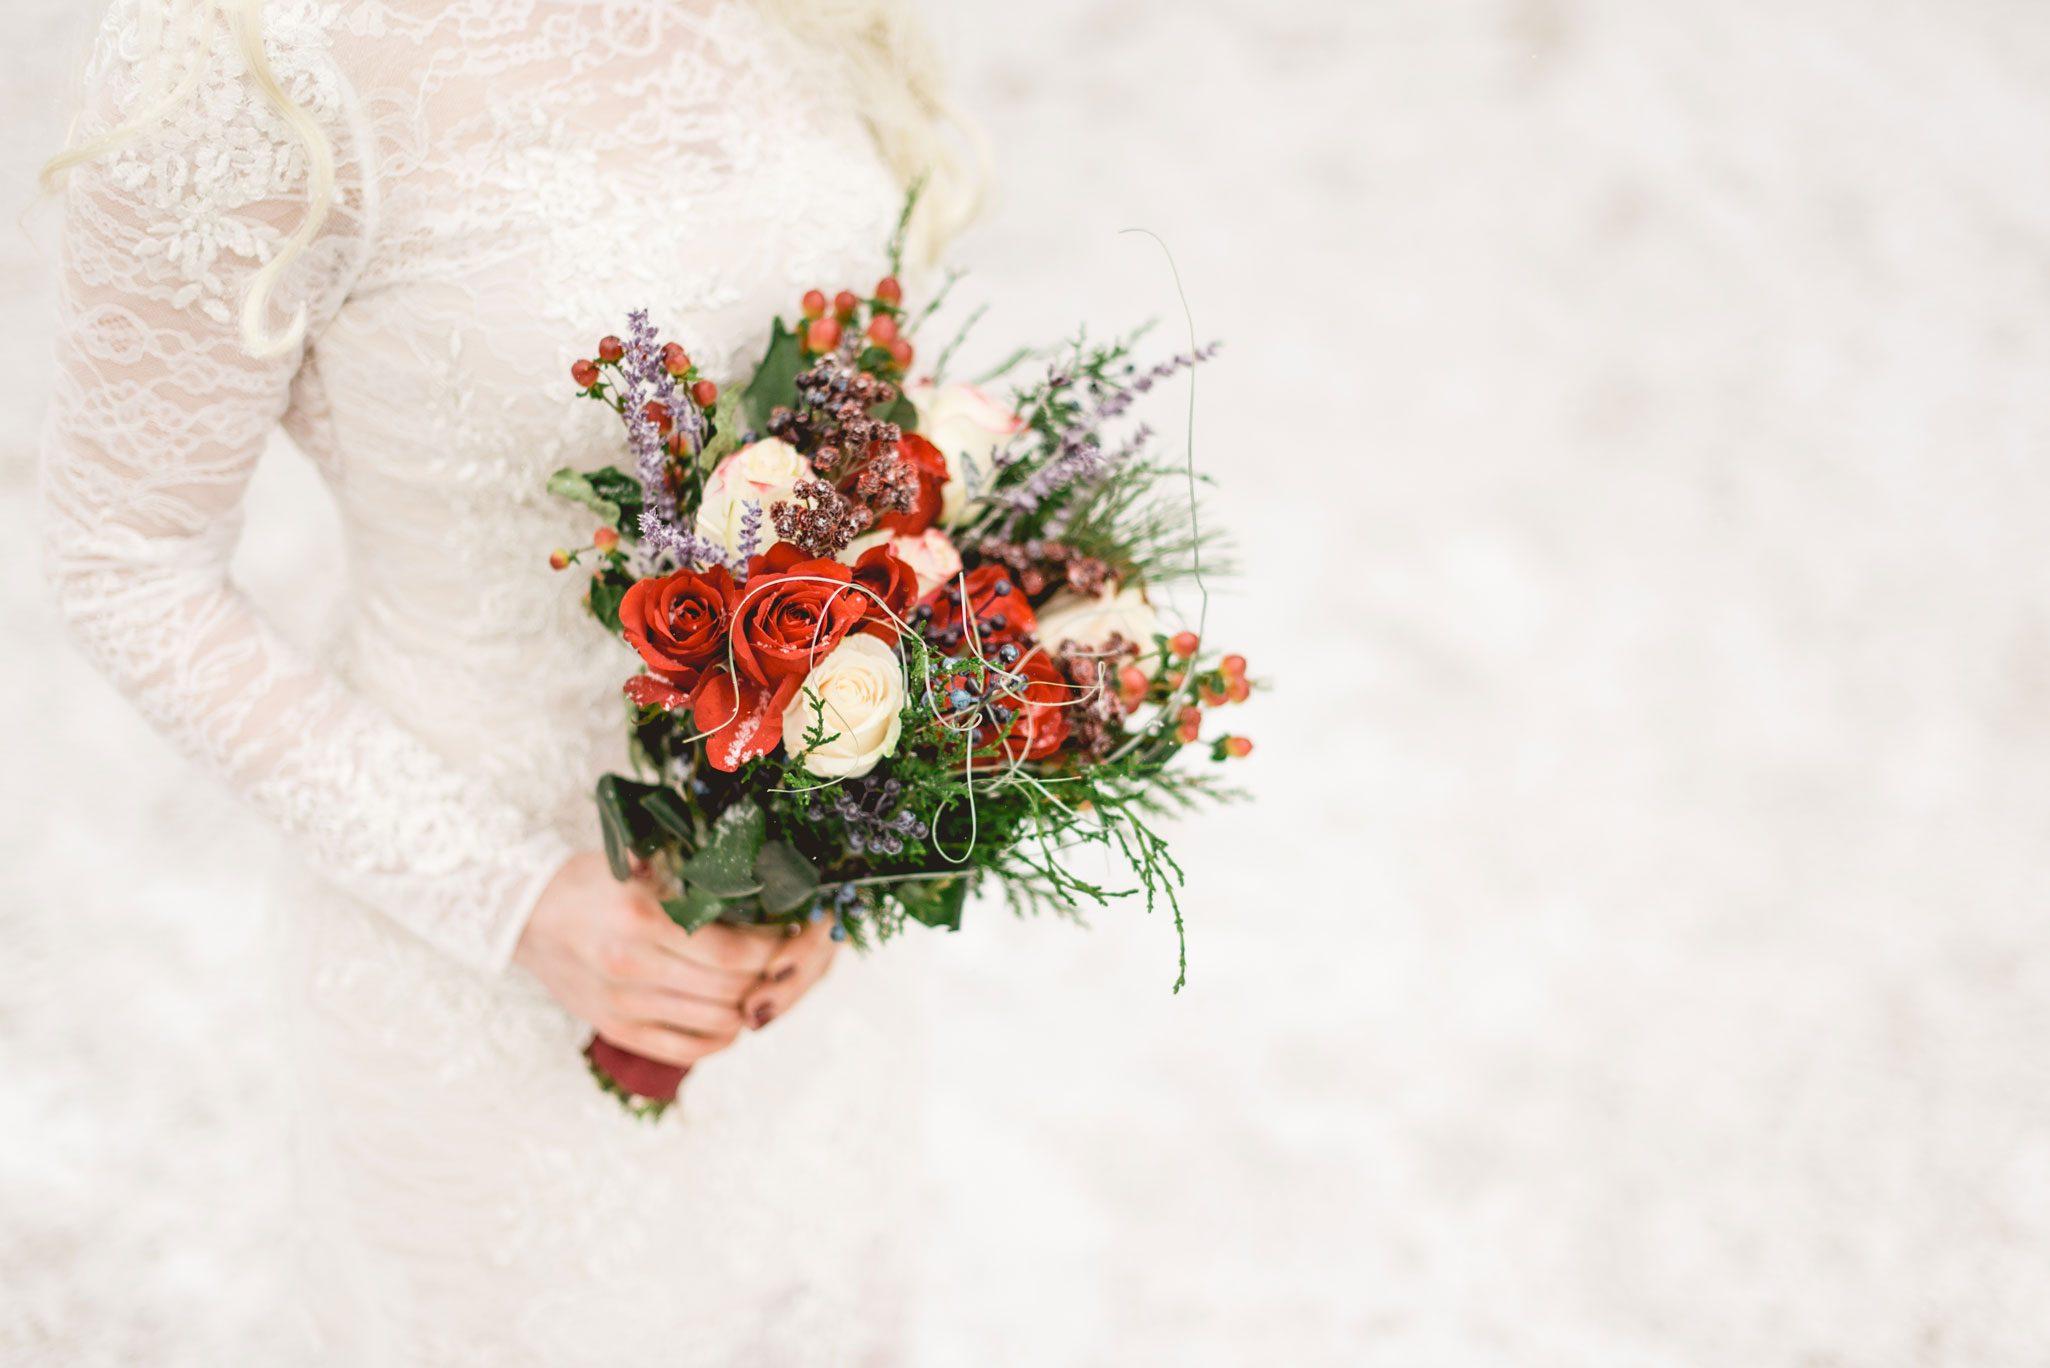 Flower Bouquet | A Snowy Mountain Elopement in Colorado